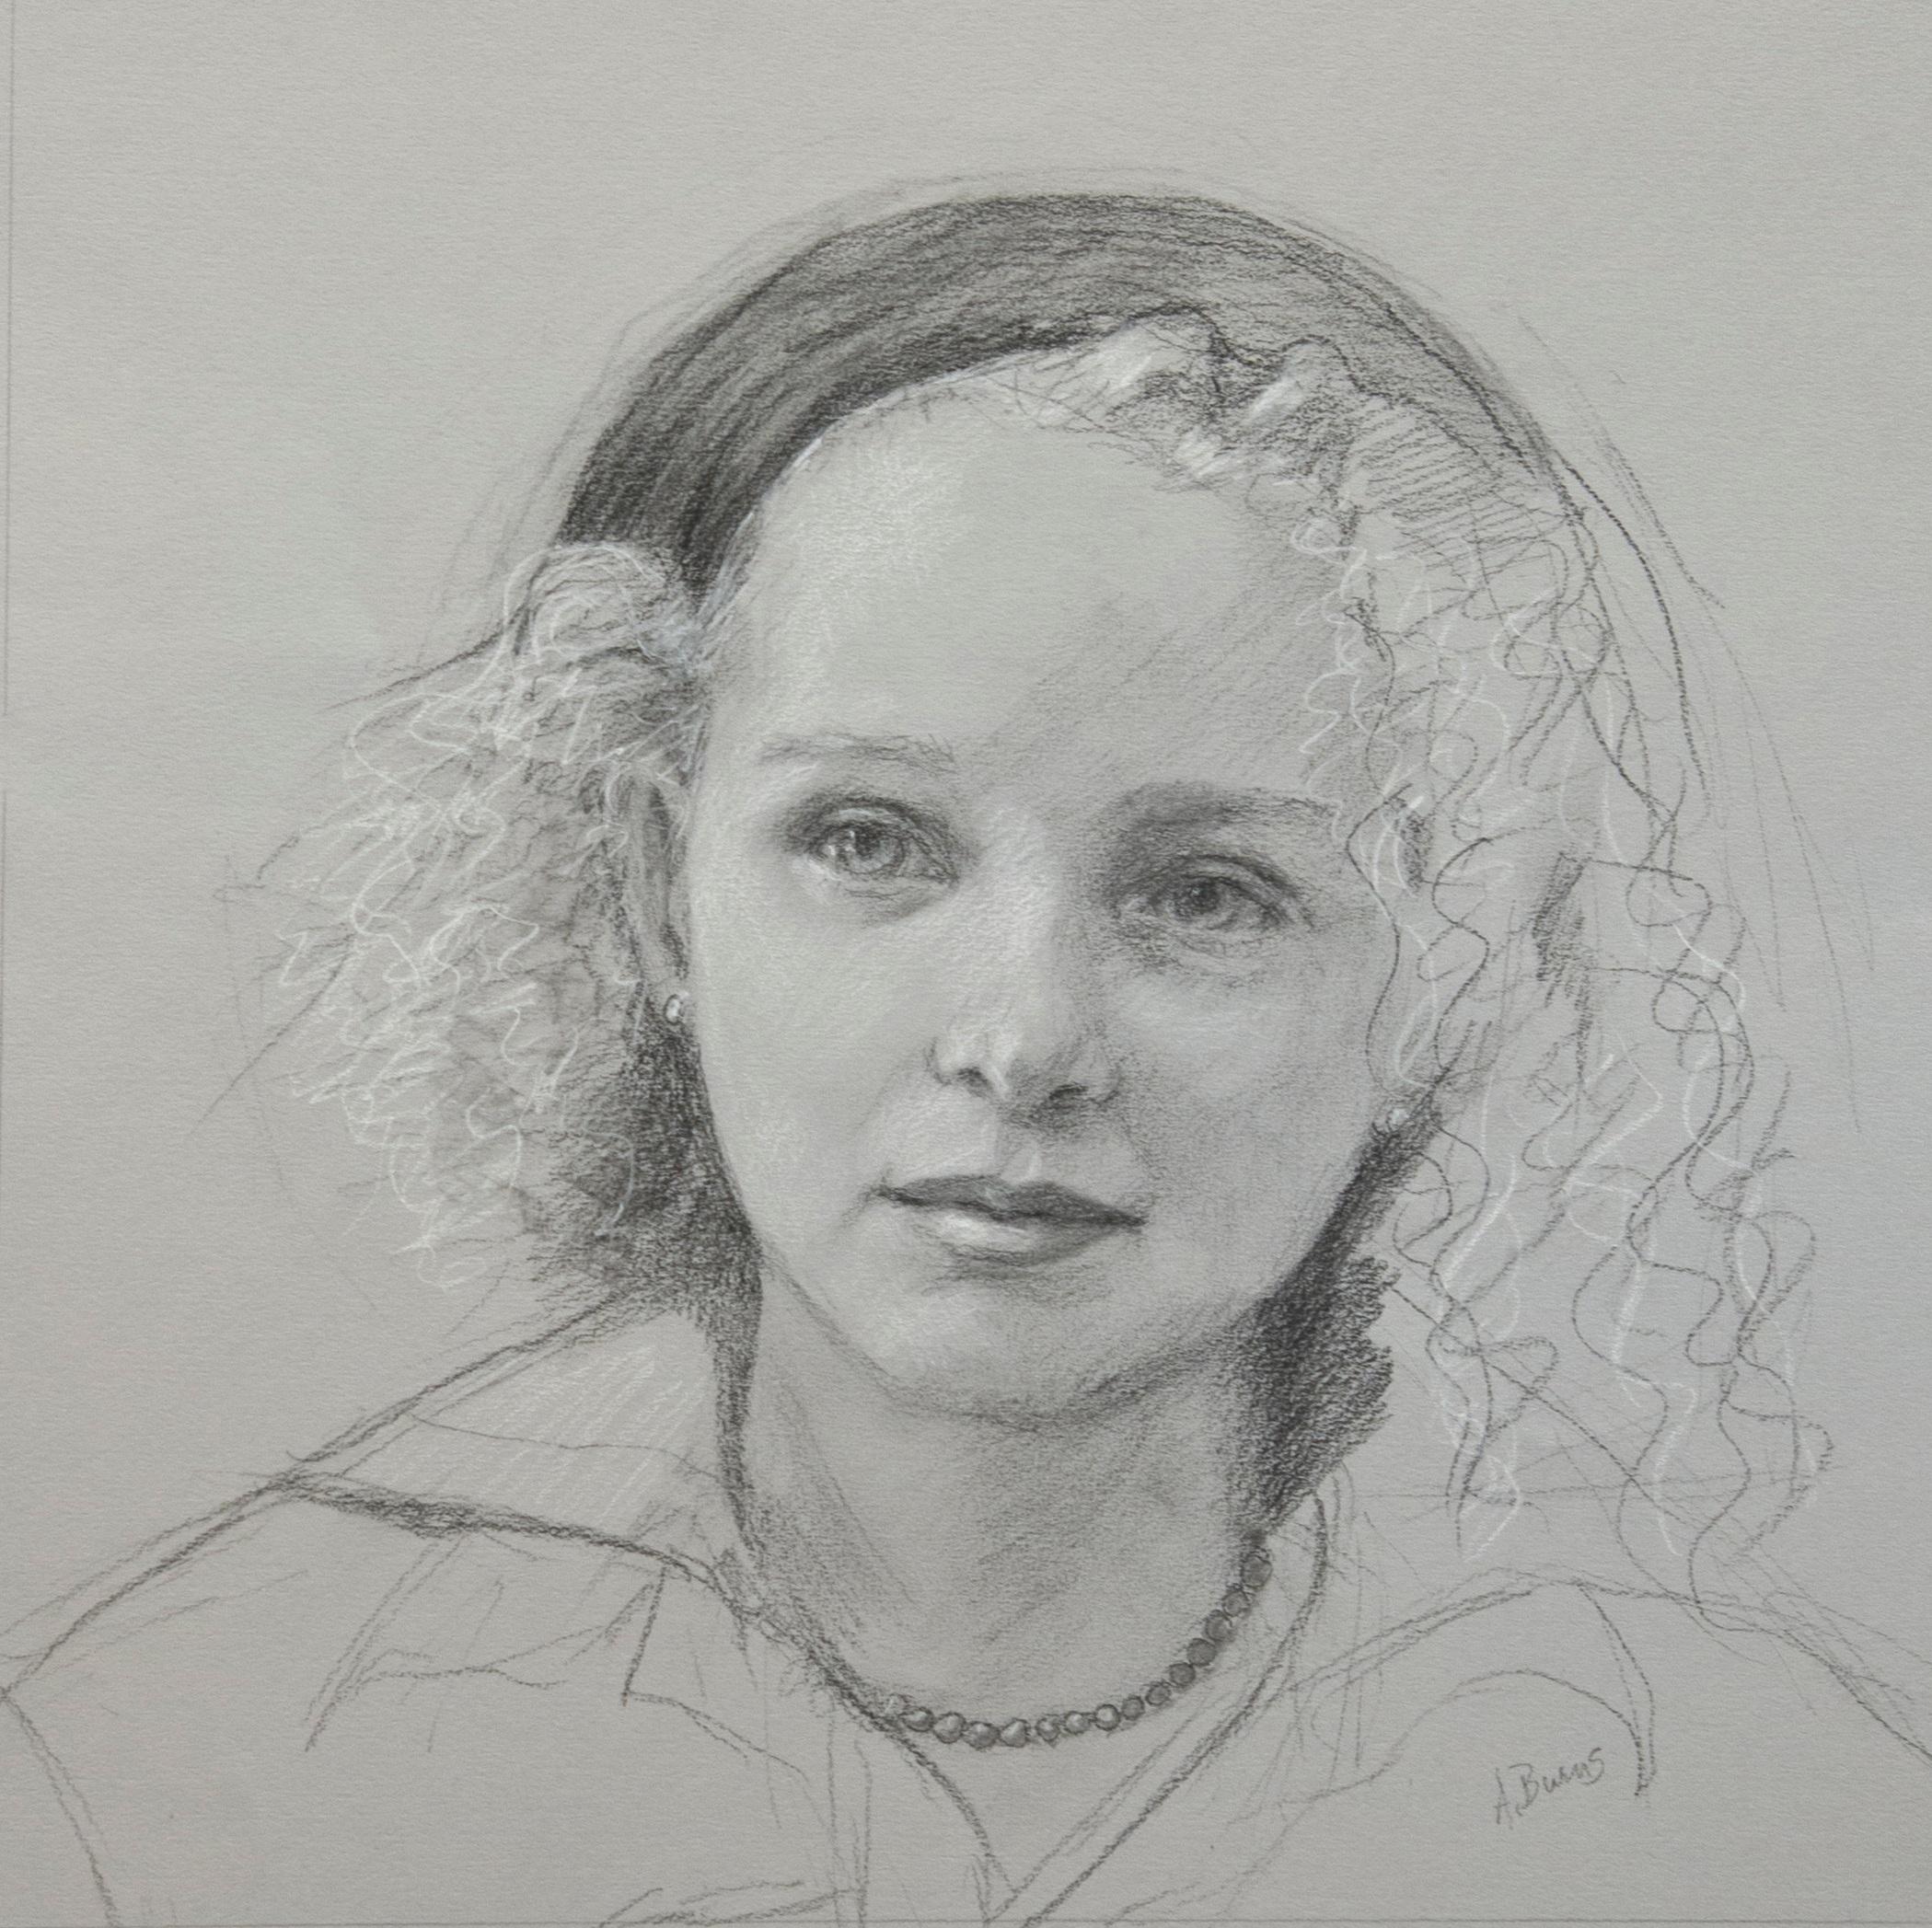 Study for portrait